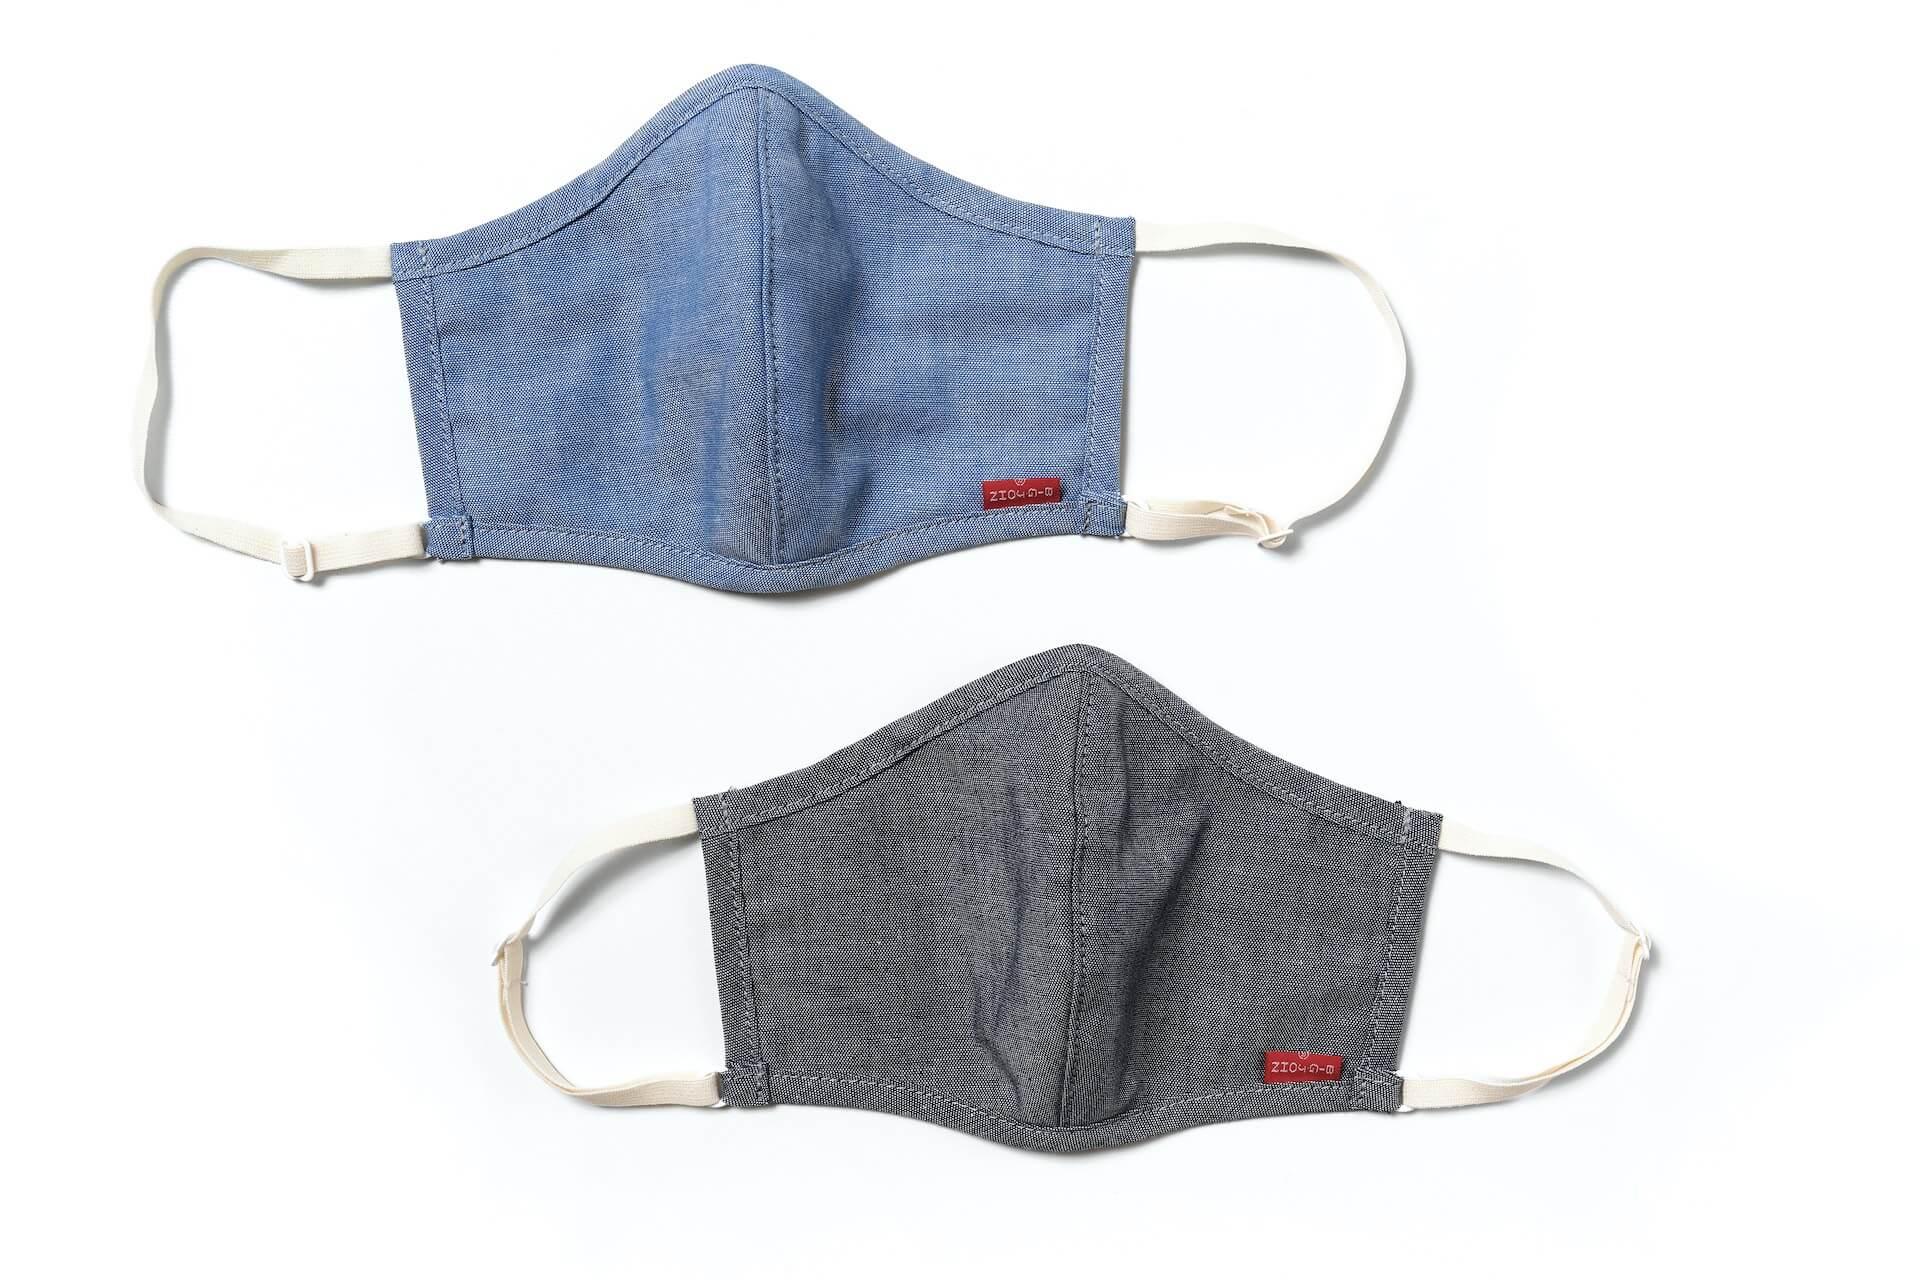 BIG JOHNから、ひんやり冷感素材の『Washable Cool Mask』が登場!予約販売も開始 lf200526_bigjohnmask_02